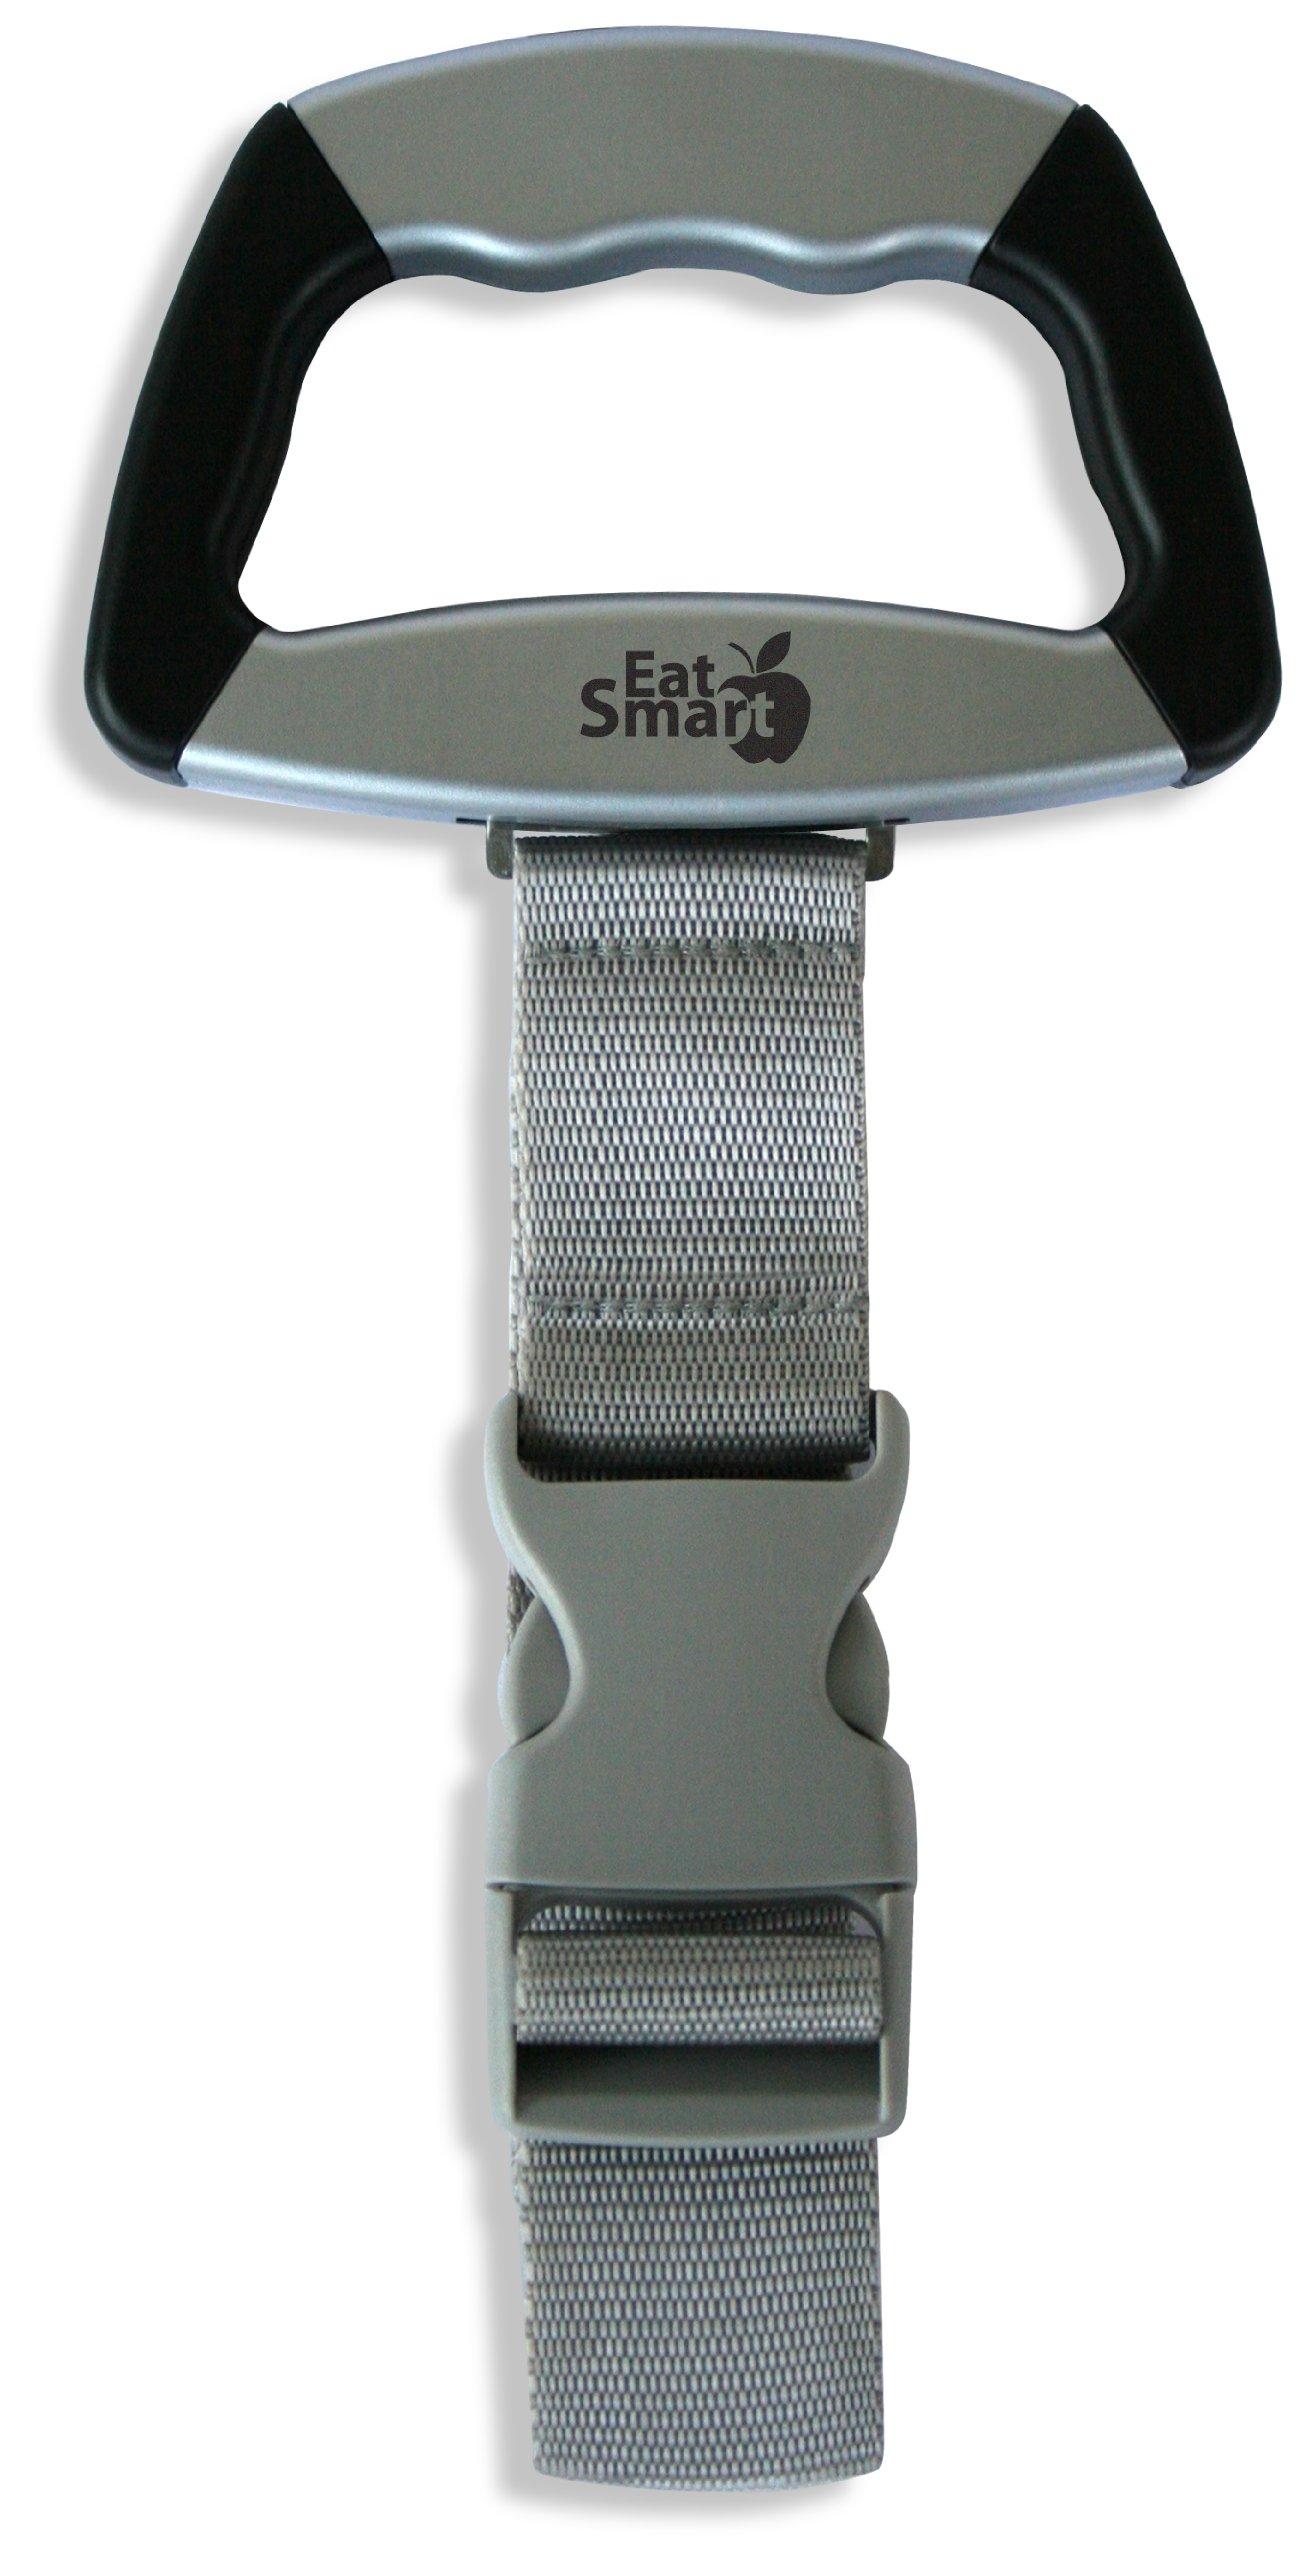 EatSmart Precision Voyager Digital Luggage Scale w/ 110 lb. Capacity & SmartGrip by EatSmart (Image #1)